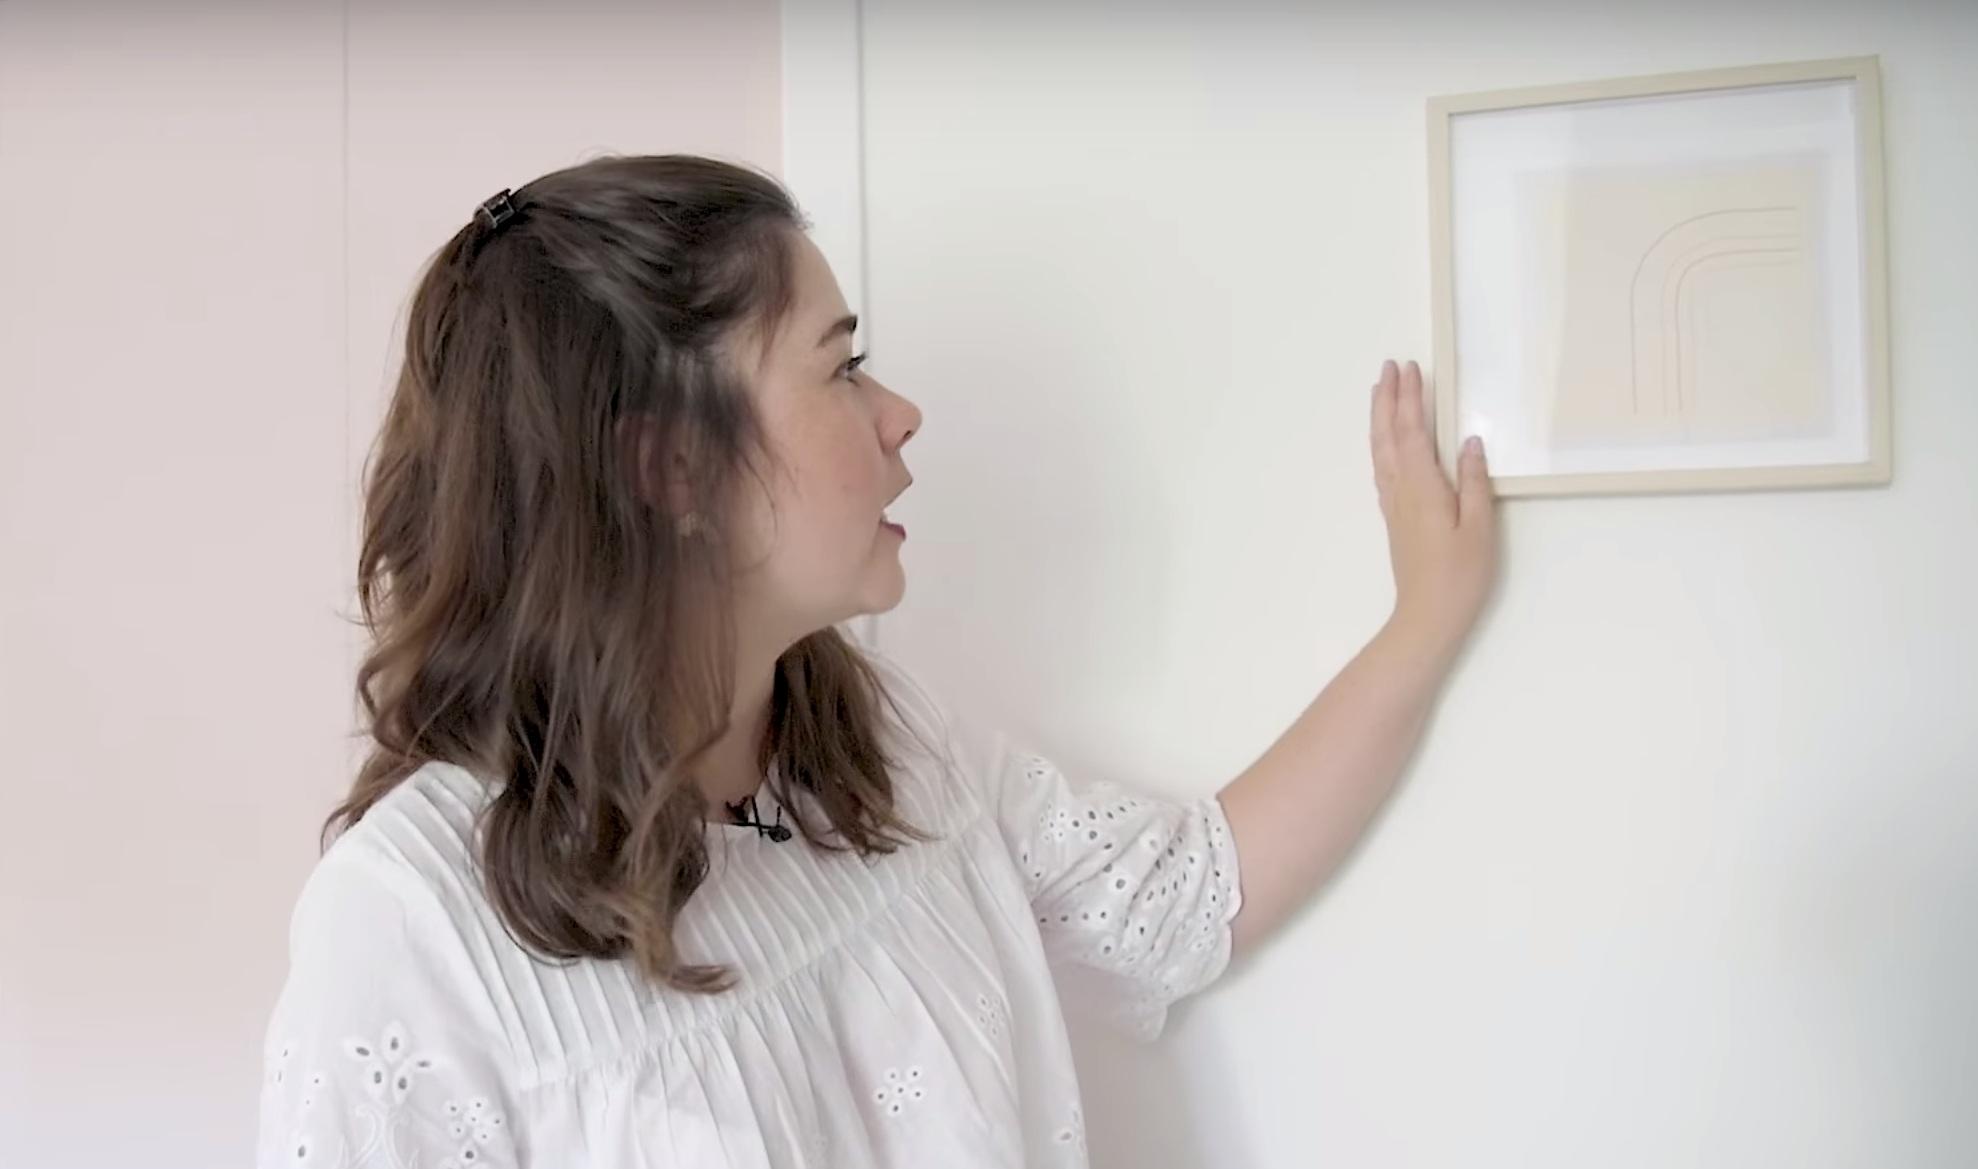 Alexandra Gater Bedroom Makeover House Tour on YouTube